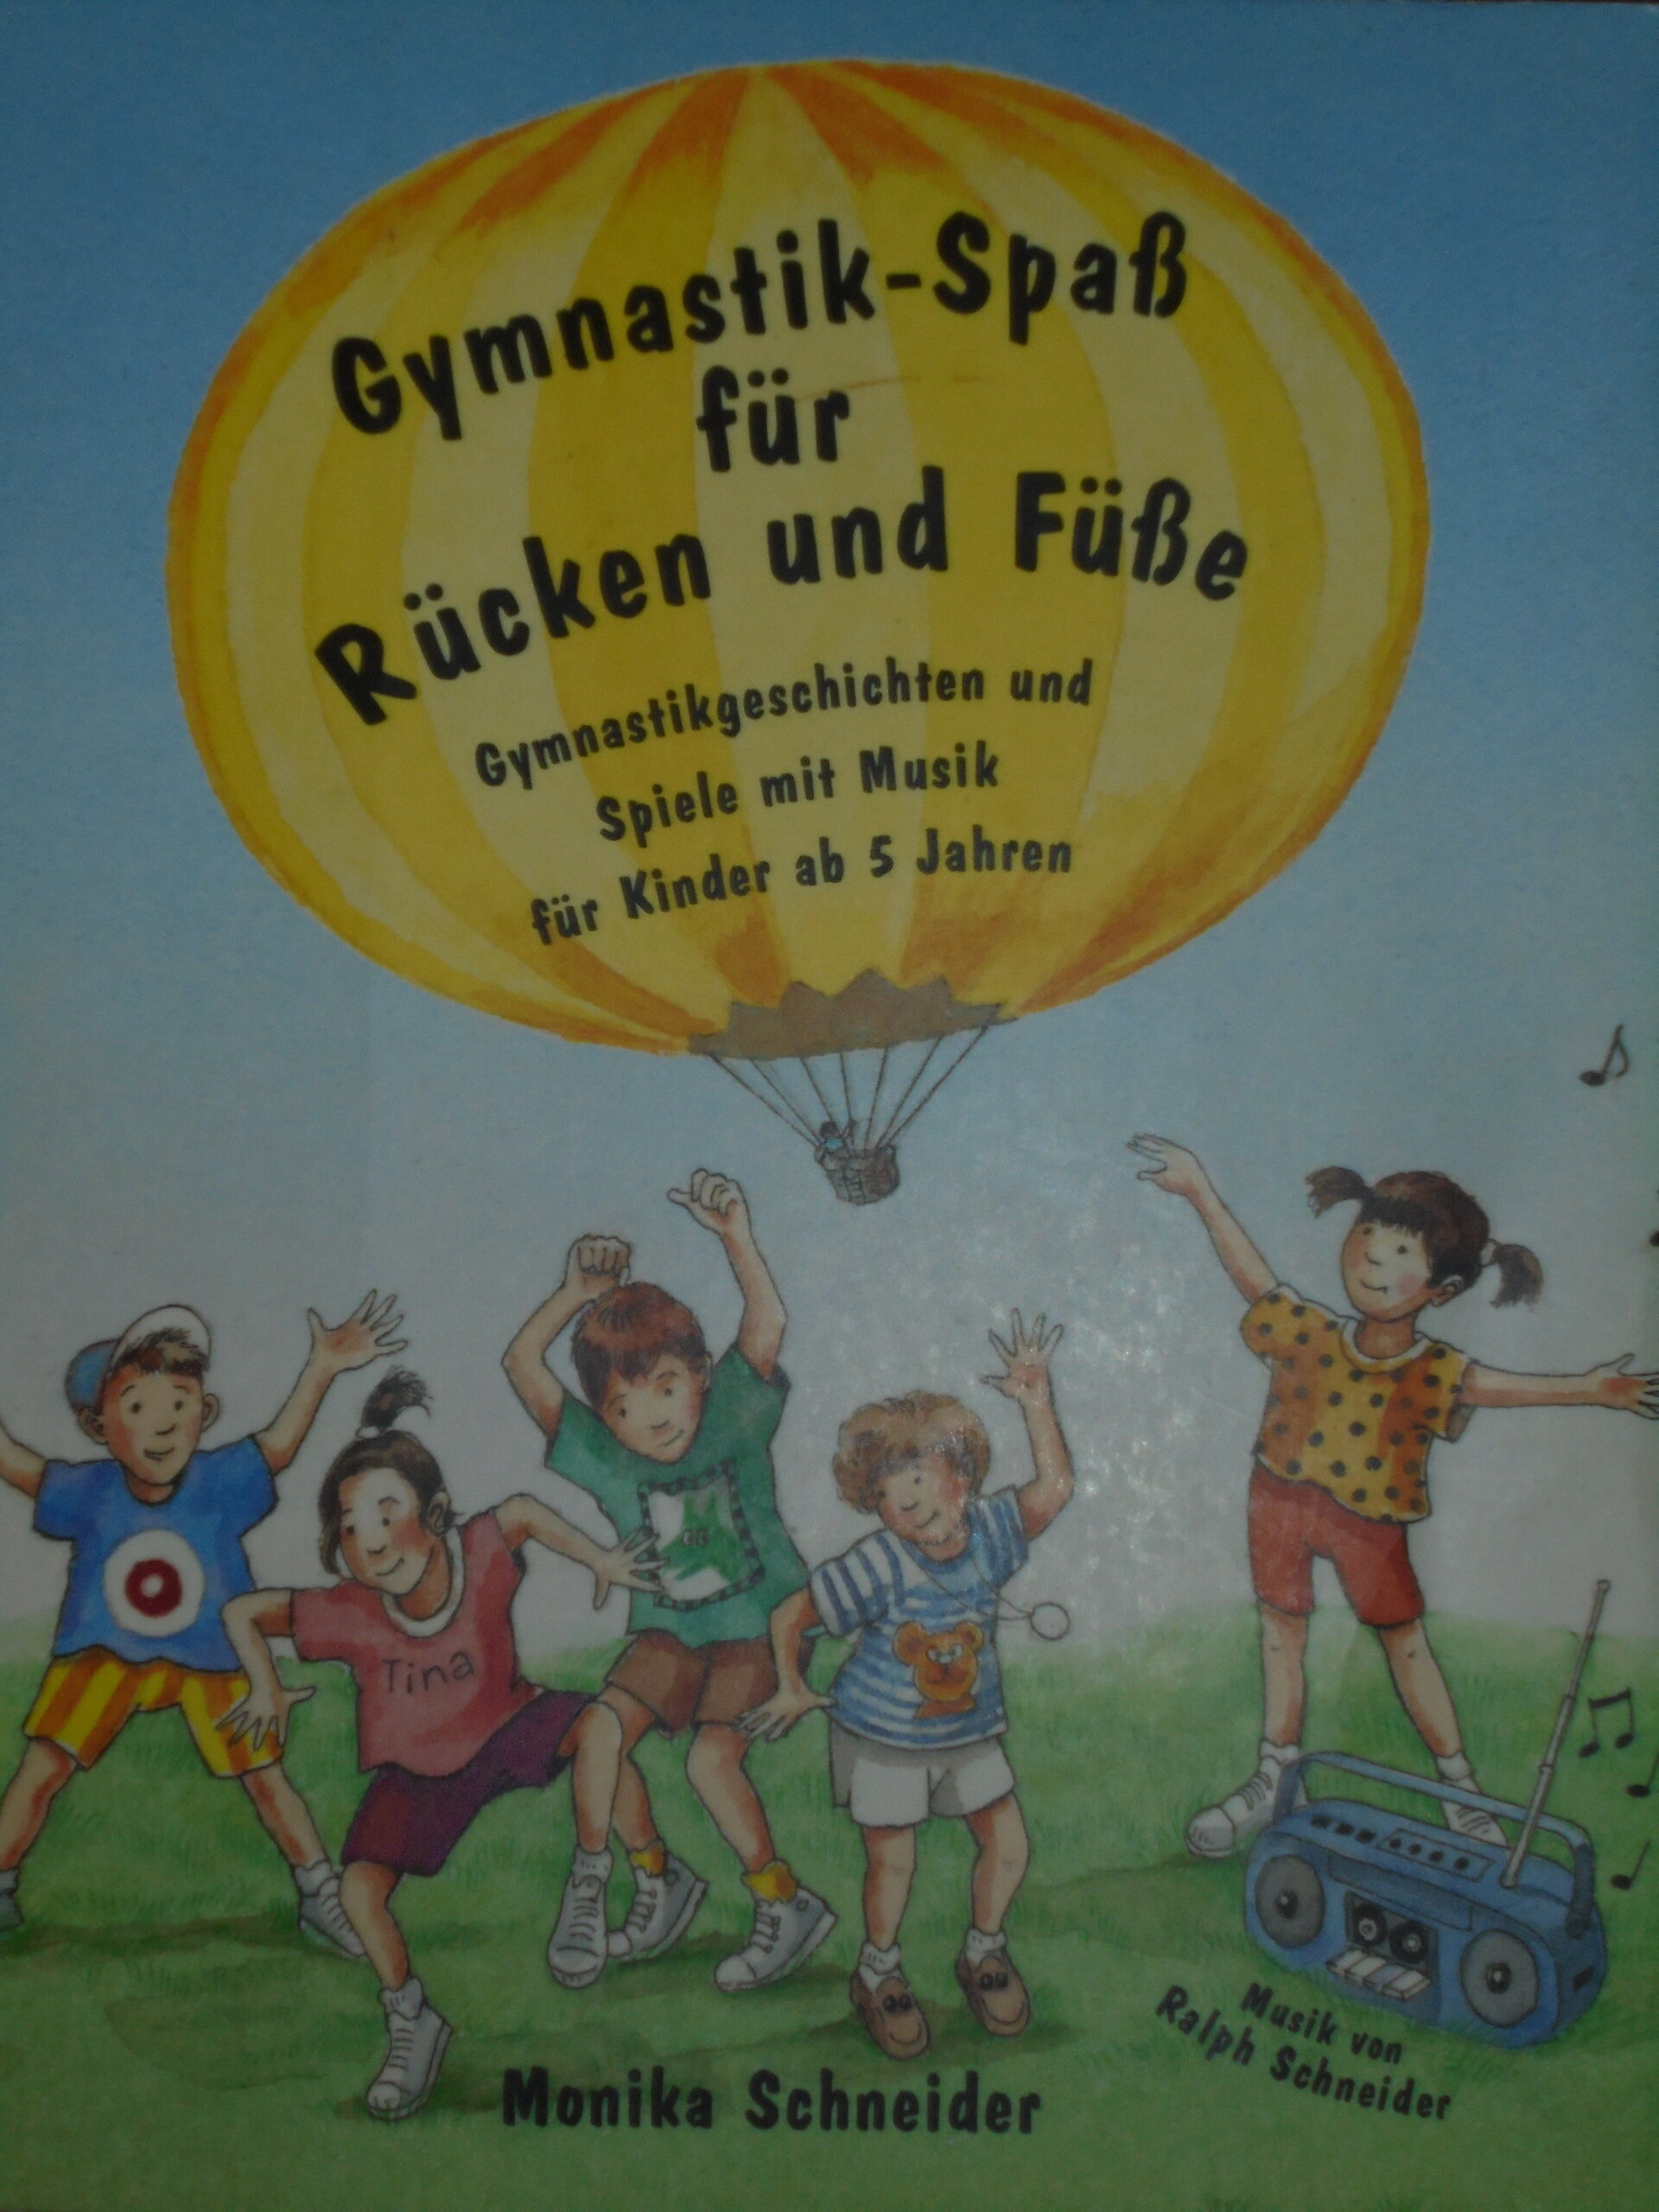 Gymnastikspaß